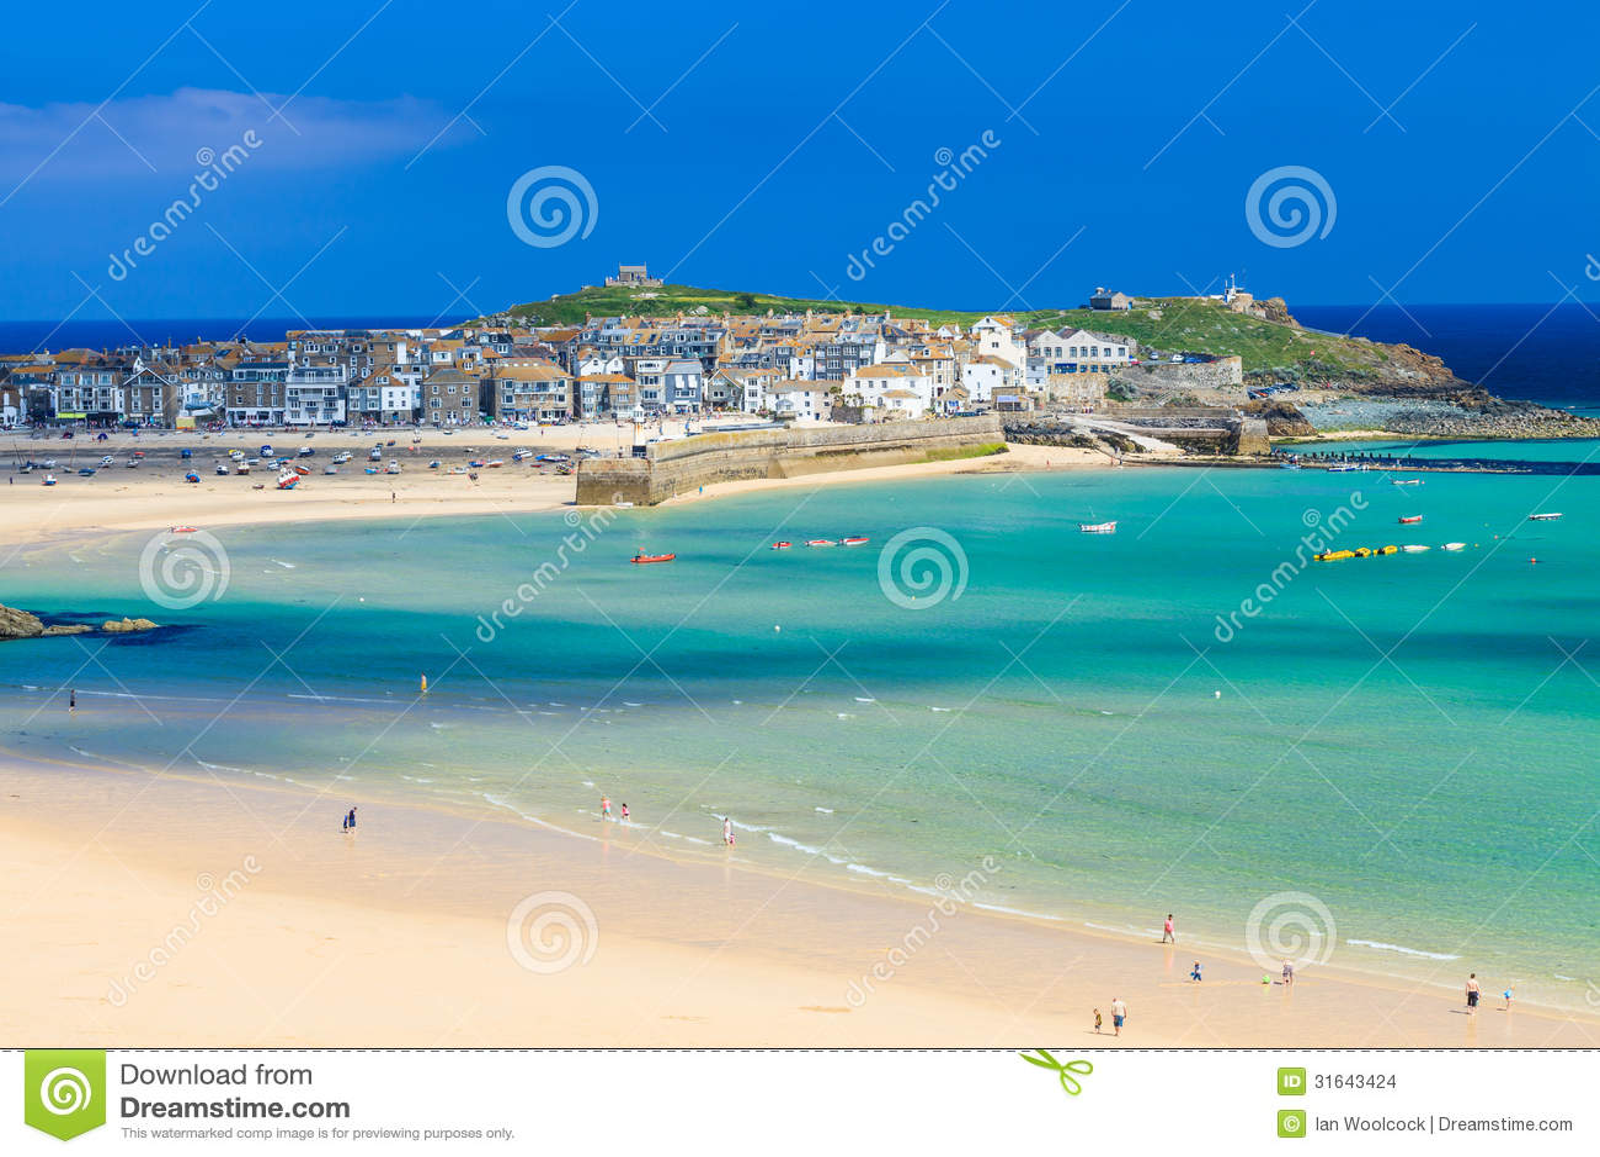 St Ives Cornwall England R-U